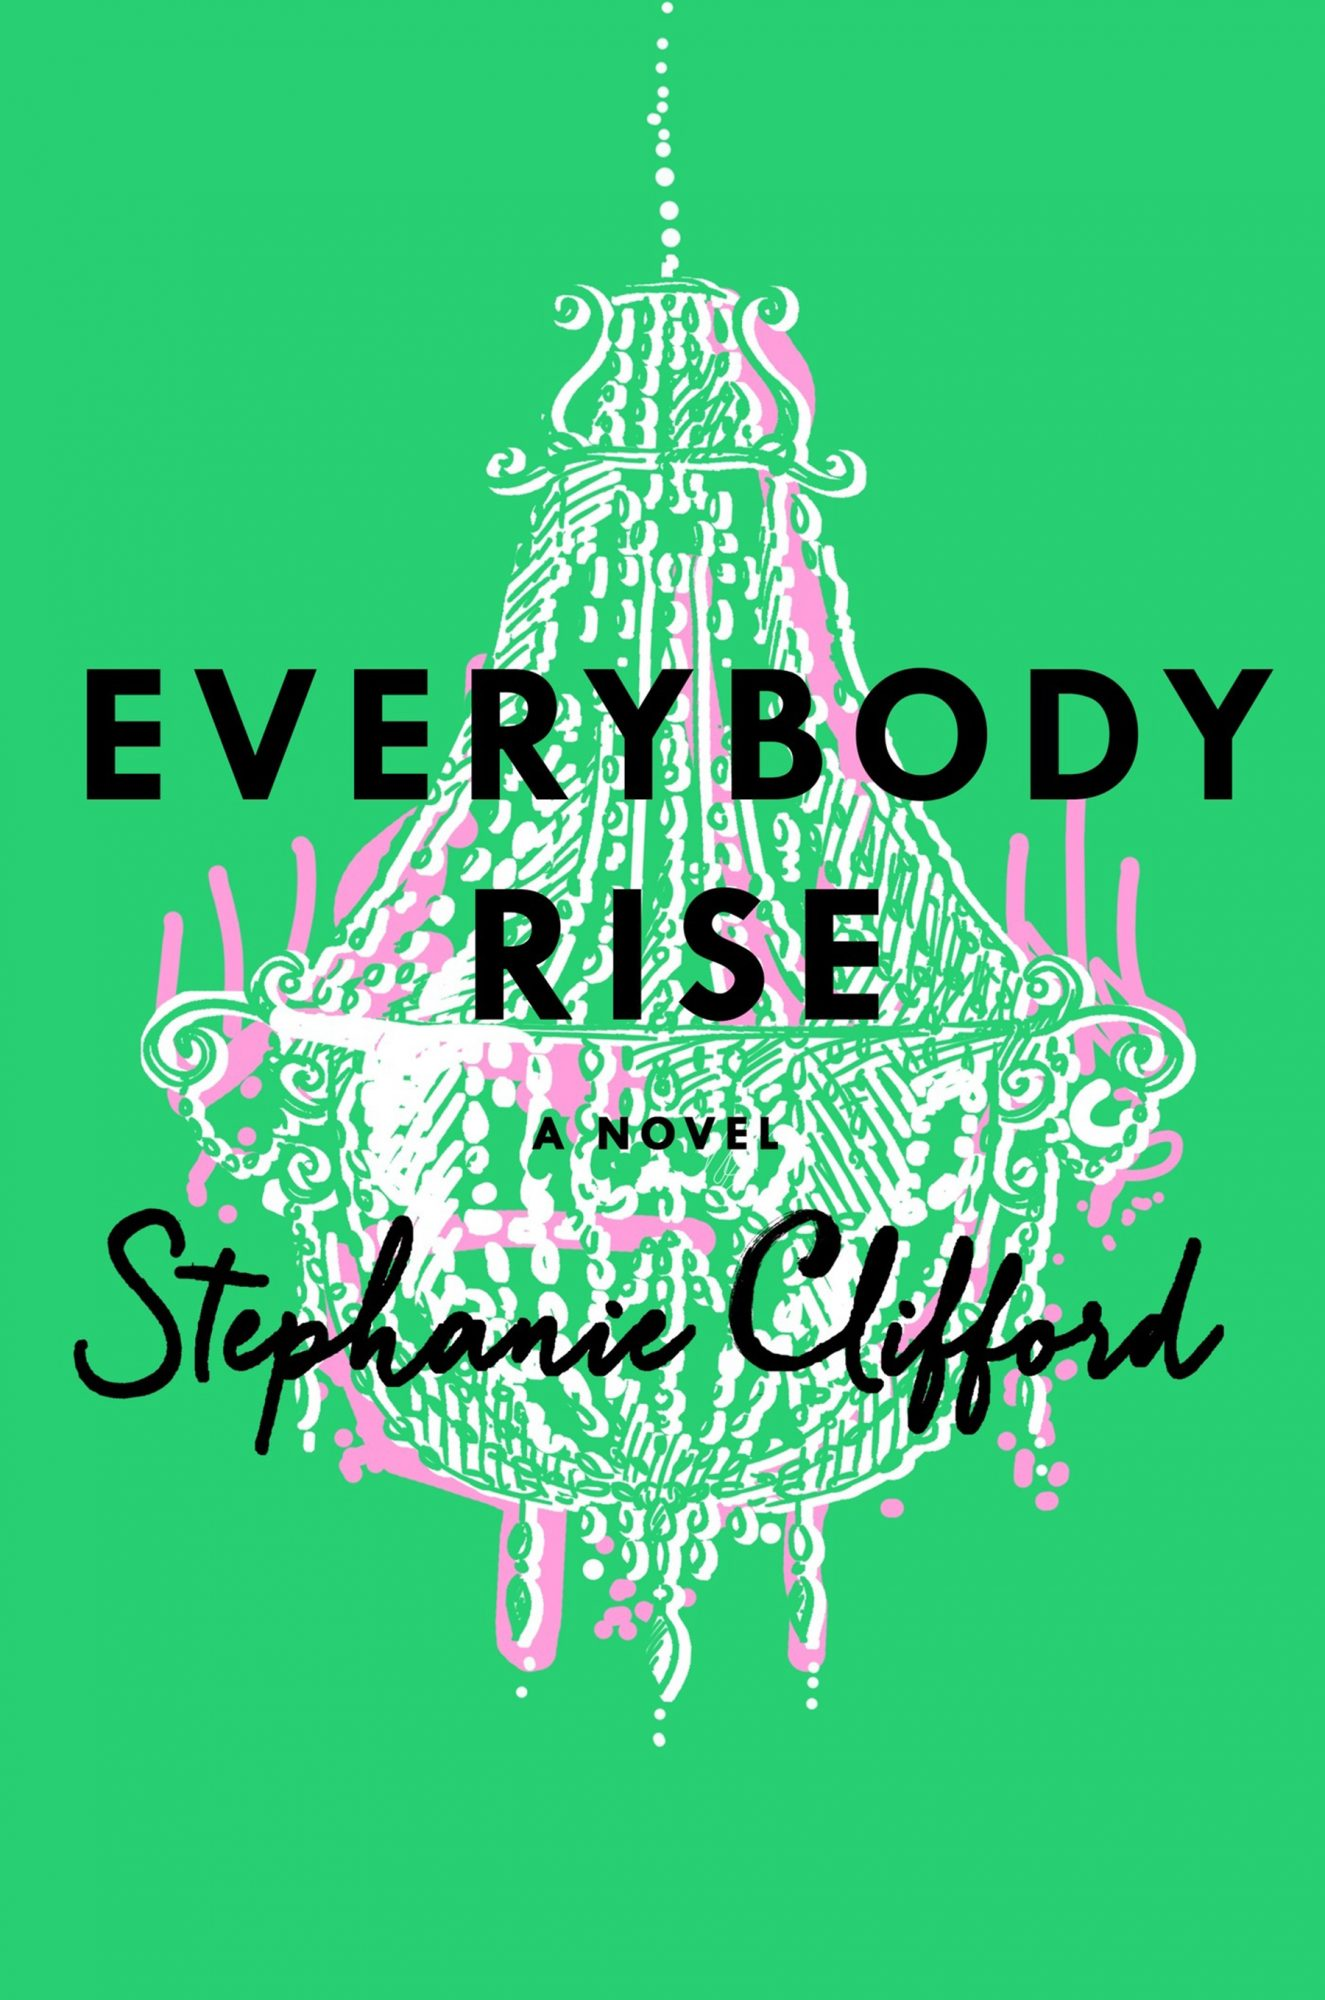 Everybody Rise (8/18/15)by Stephanie Clifford